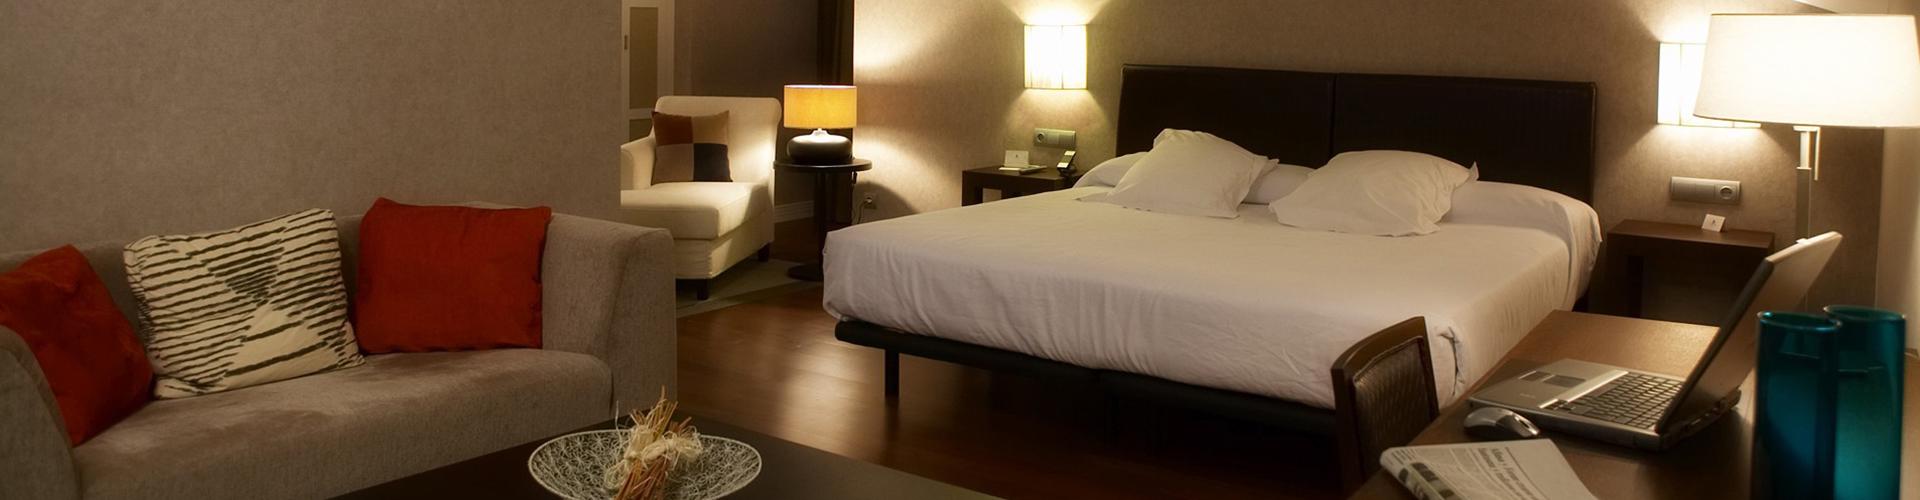 HOTEL BALNEARIO VILLA DE OLMEDO (5)